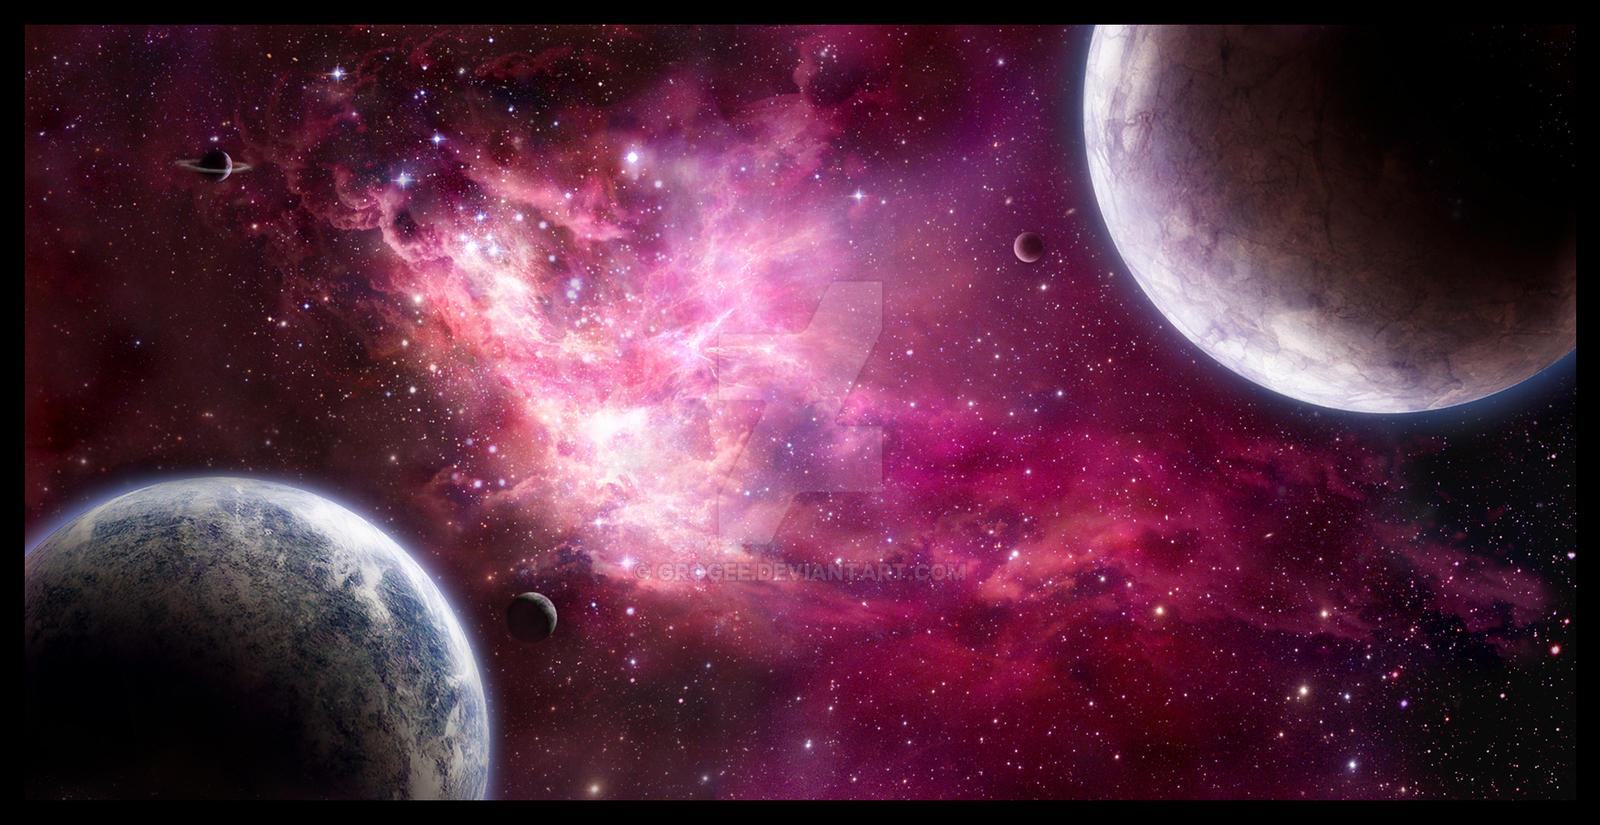 Stellar by Grogee